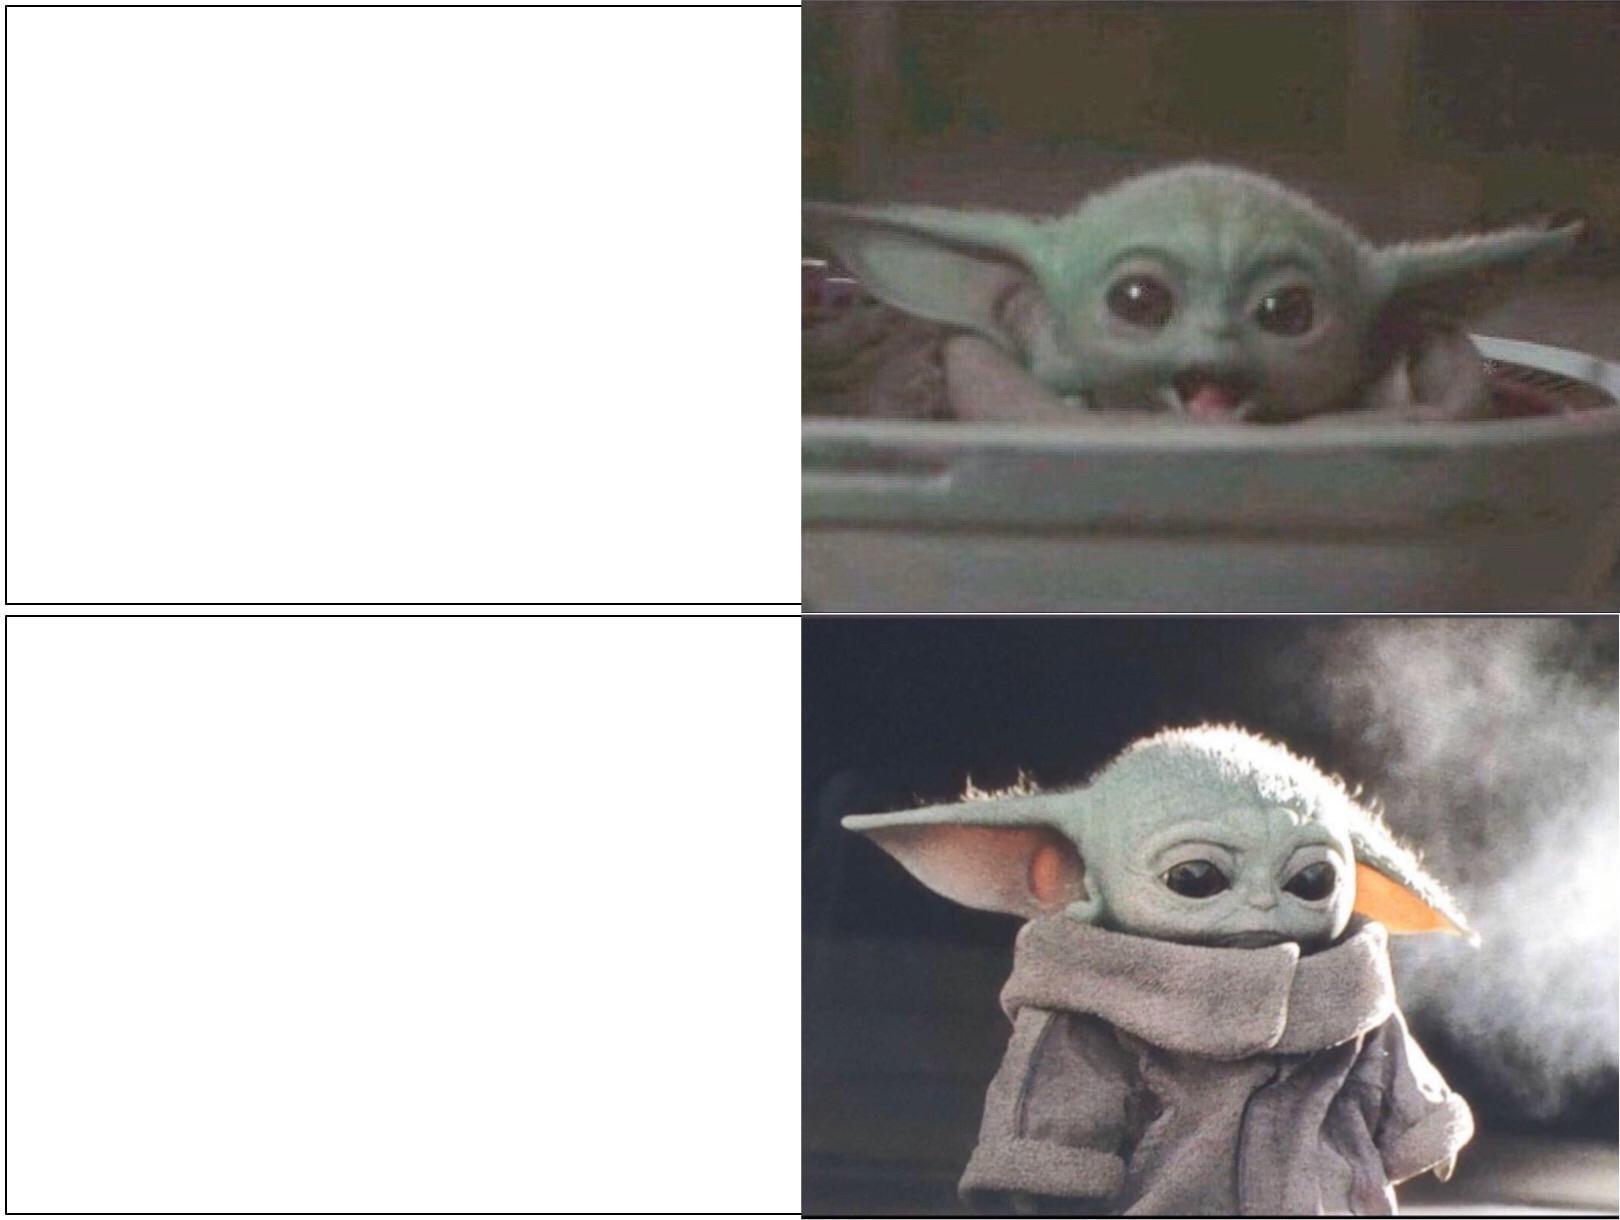 Baby Yoda Happy Then Sad Blank Template Imgflip